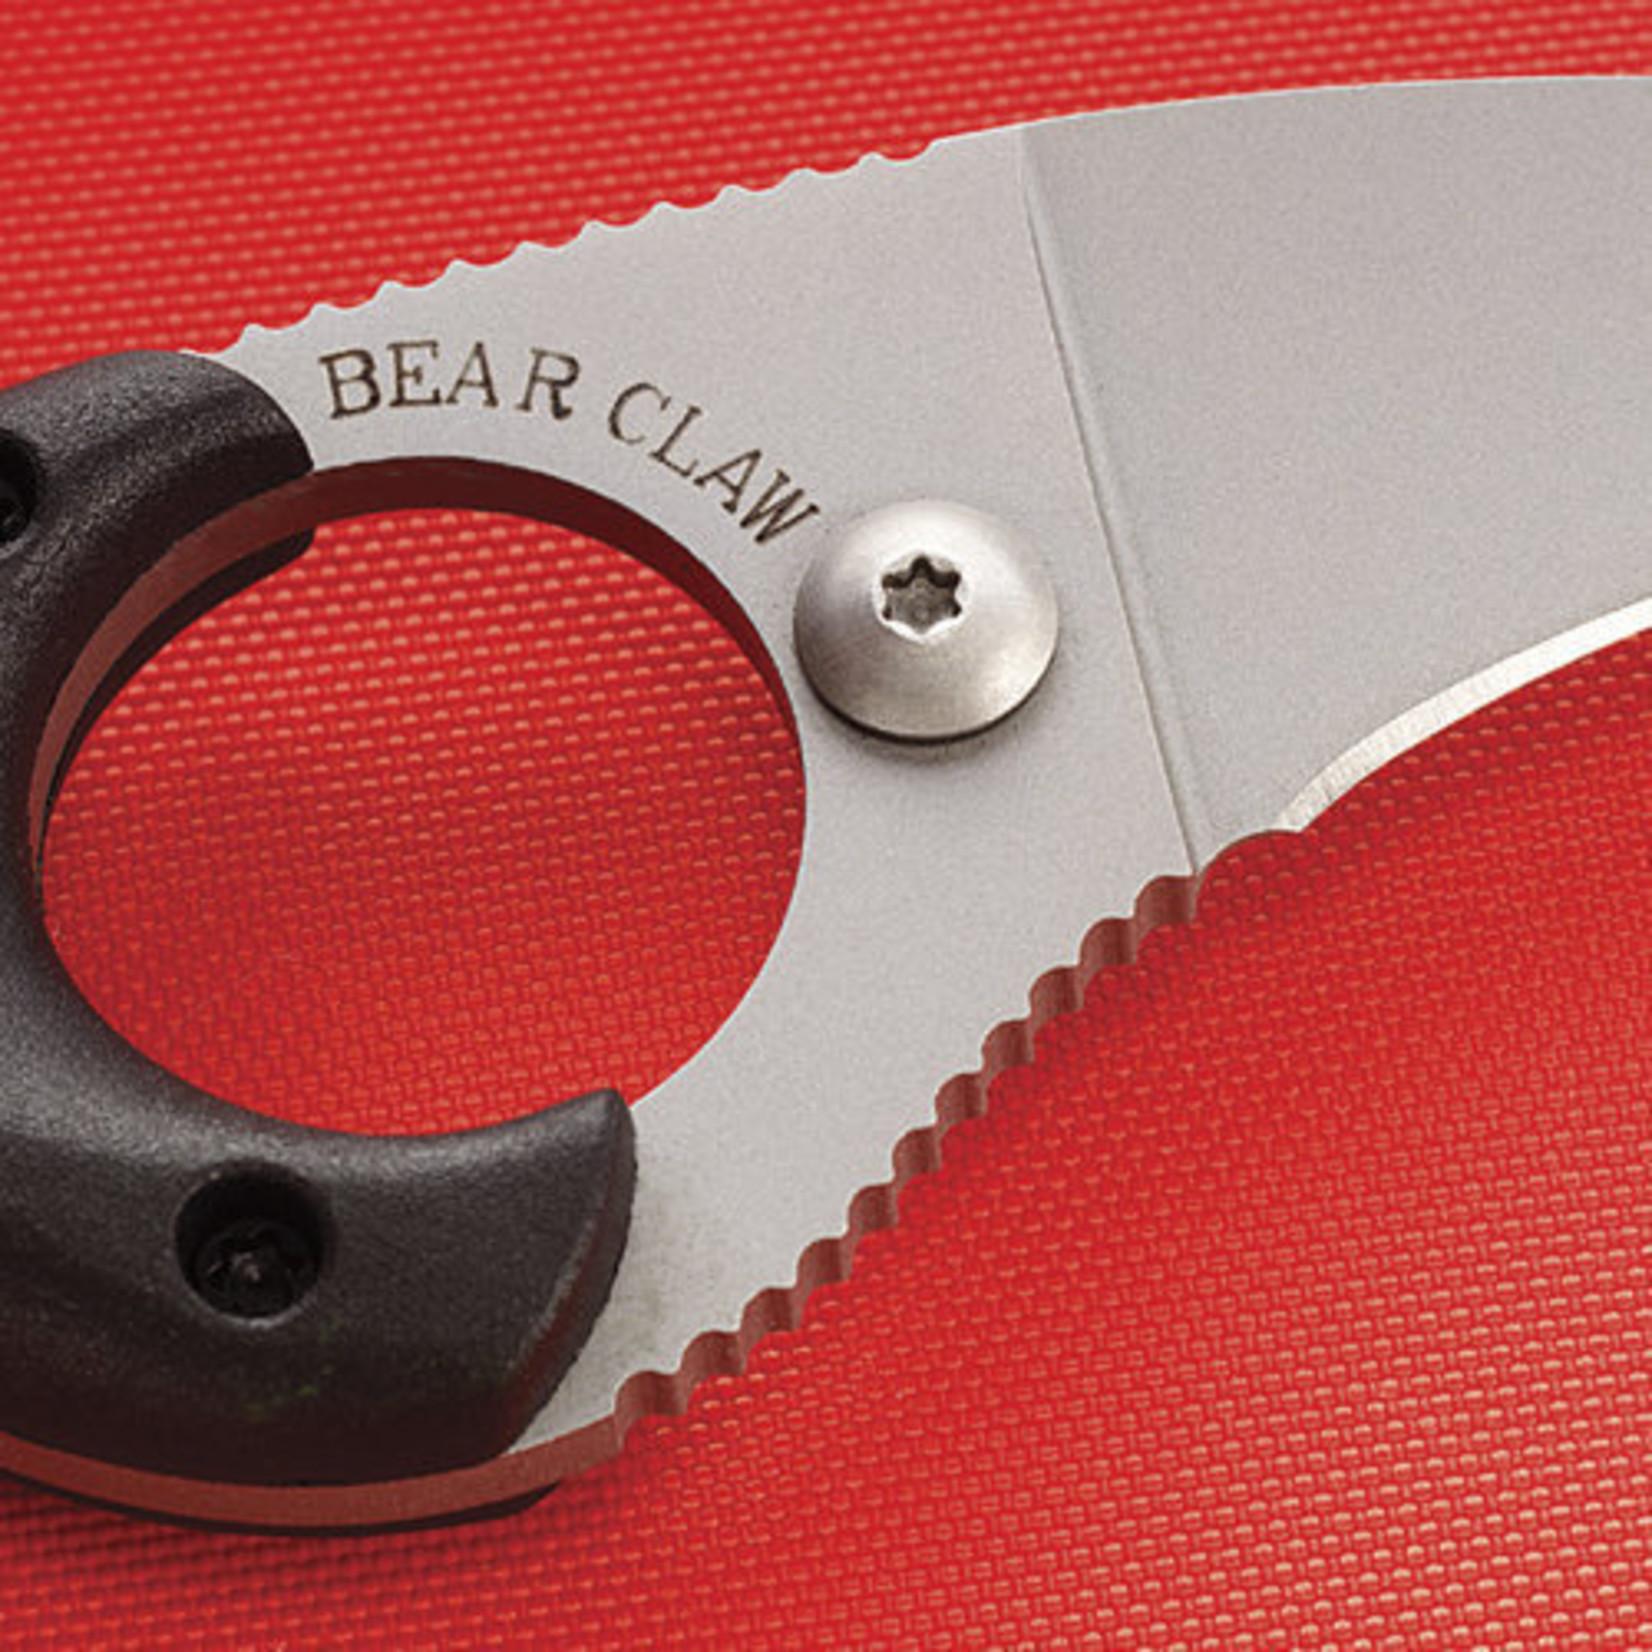 CRKT CRKT Bear Claw kartel zonder punt